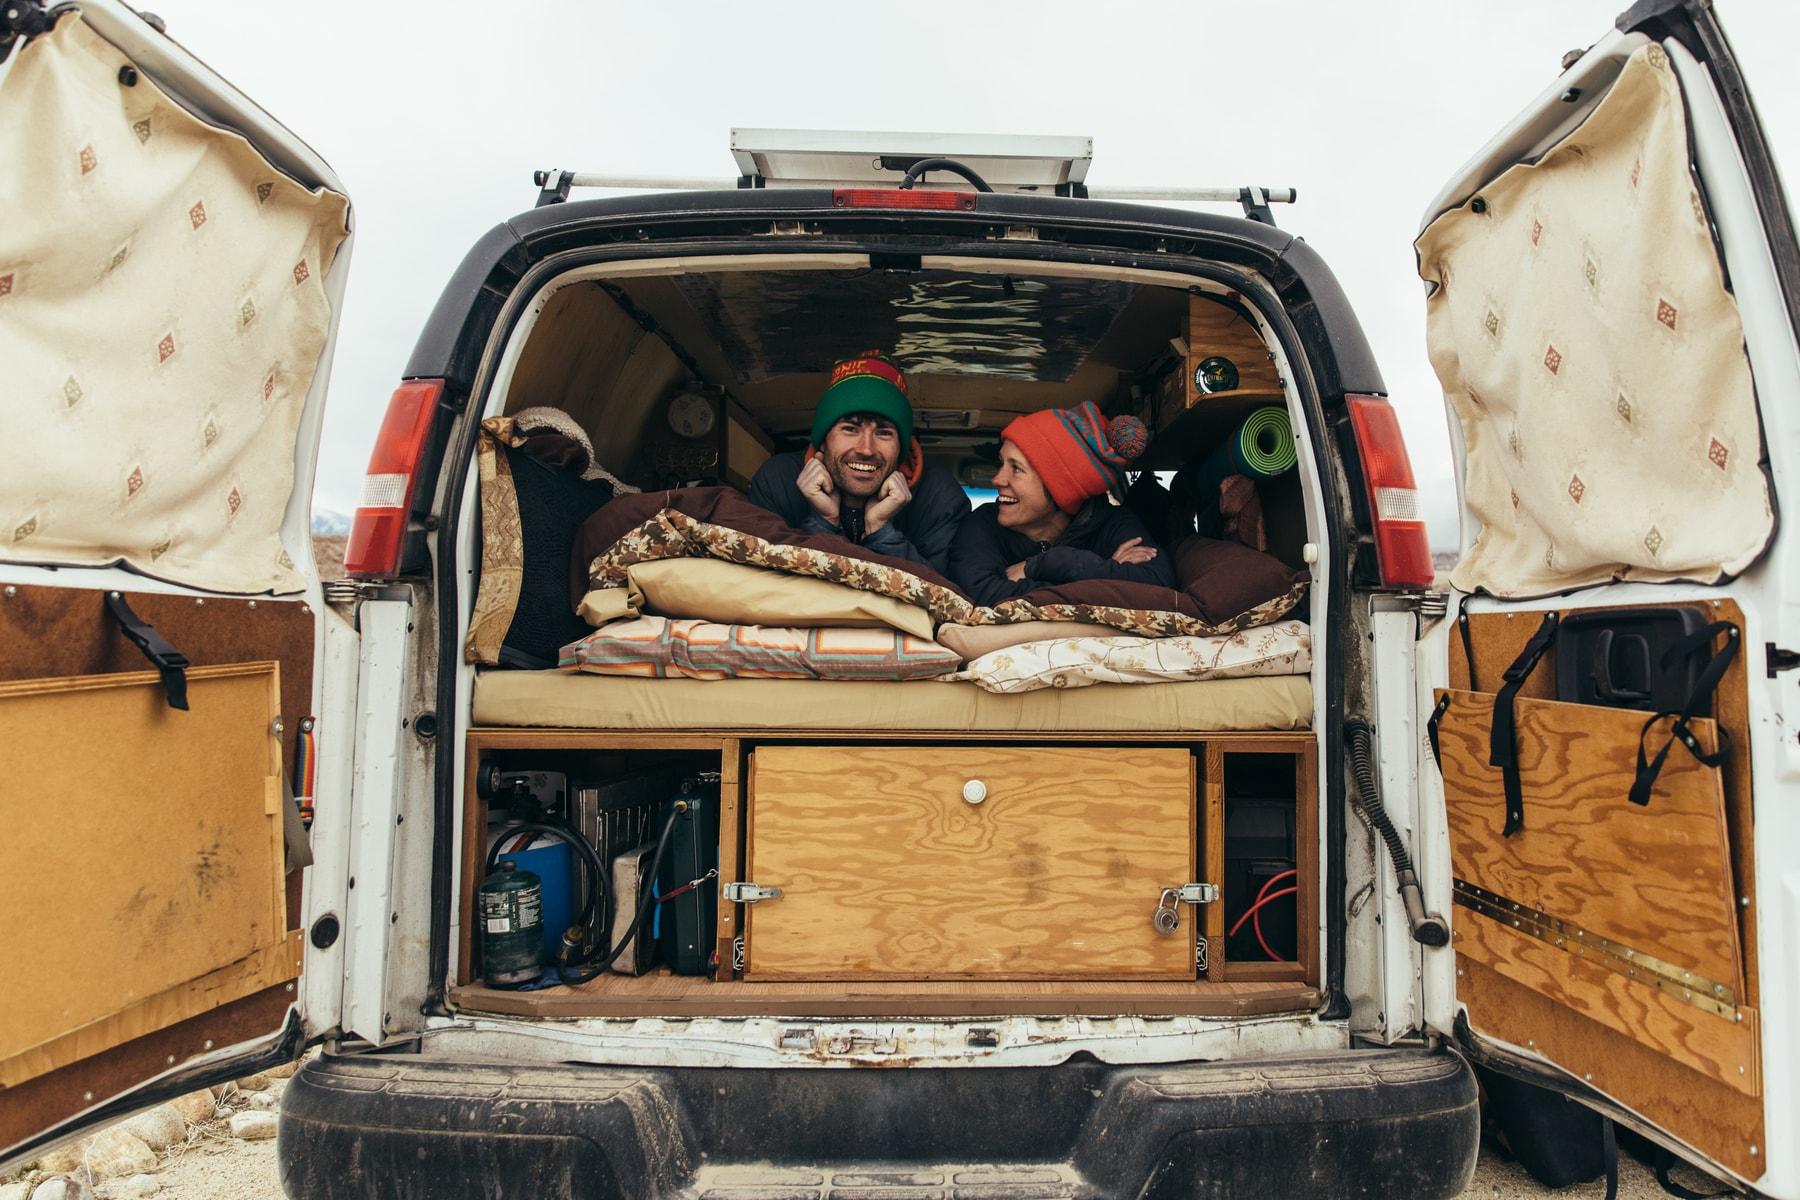 moja gear dirtbag dwelling series - Photographed